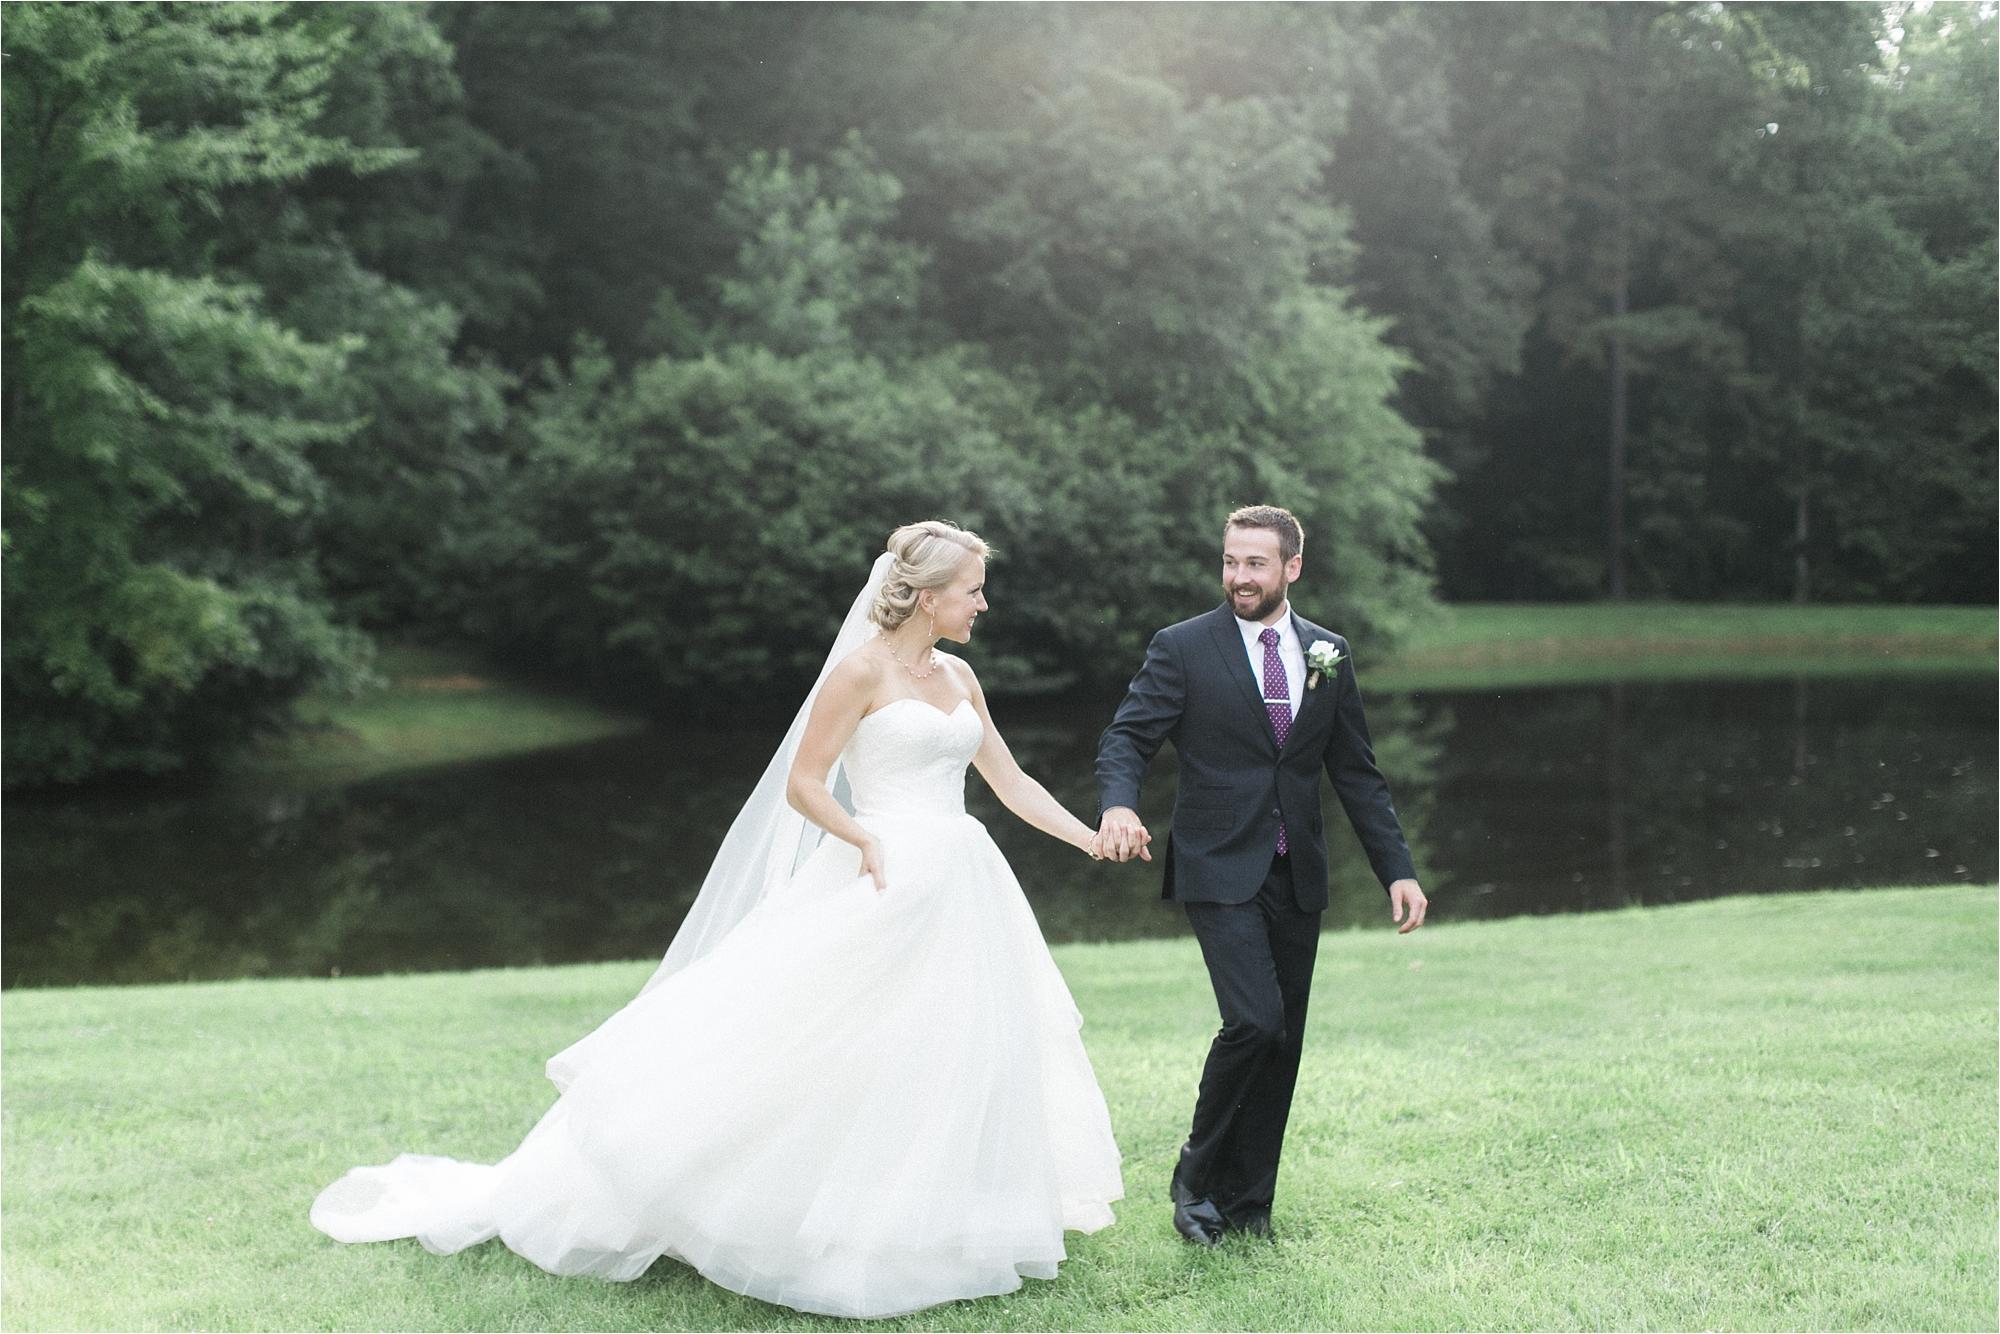 fredericksburg-virginia-stevenson-ridge-wedding-stephanie-yonce-photo_0033.jpg